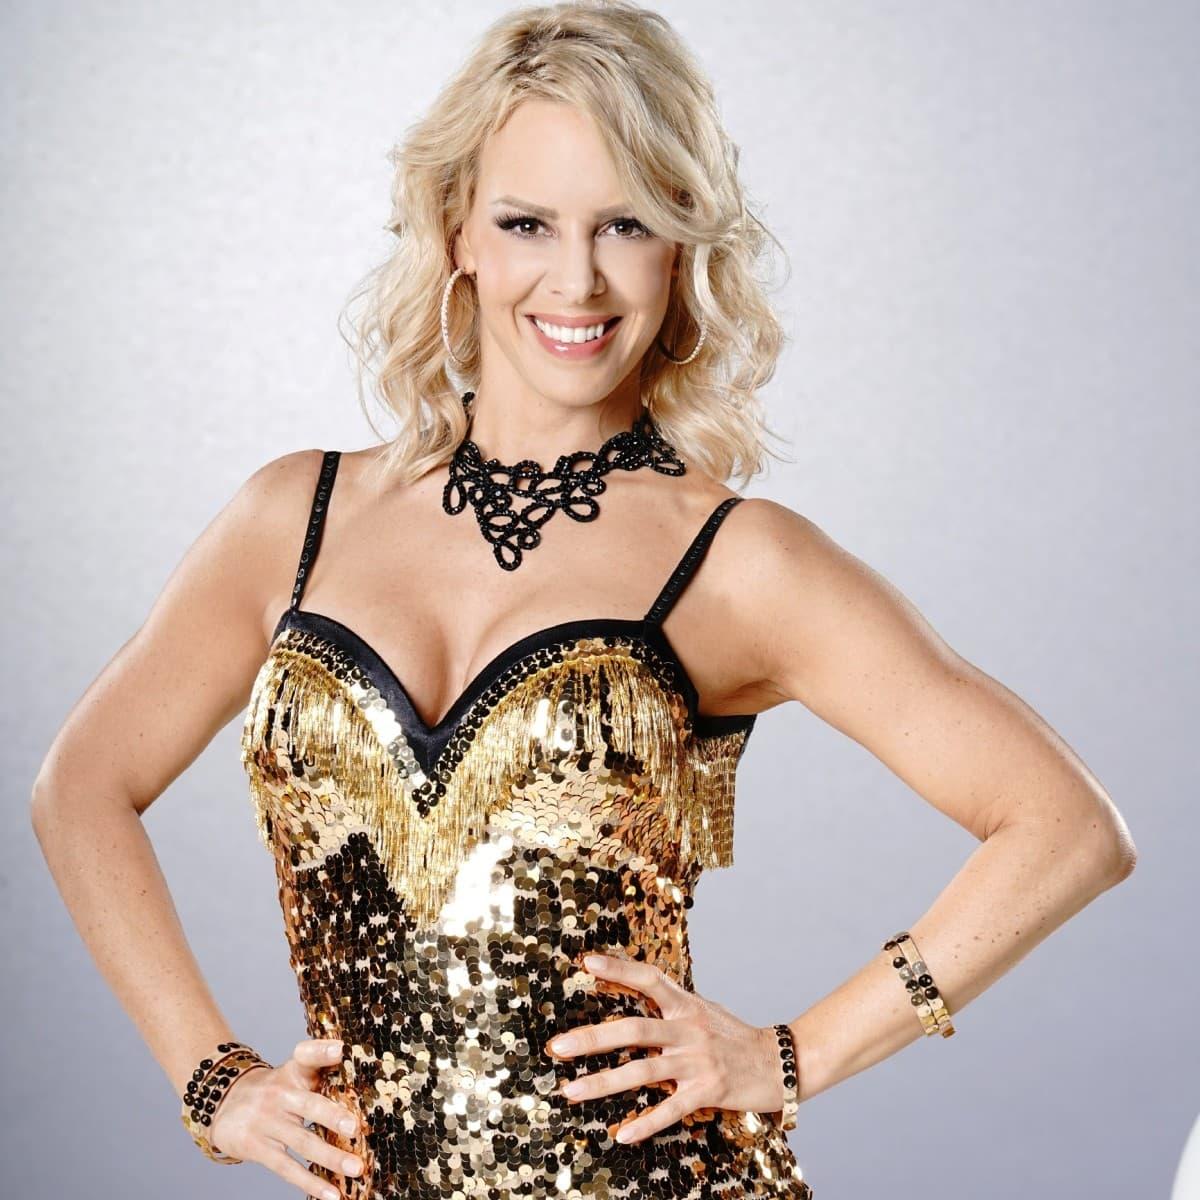 Isabel Edvardsson Profi-Tänzerin bei Let's dance 2019